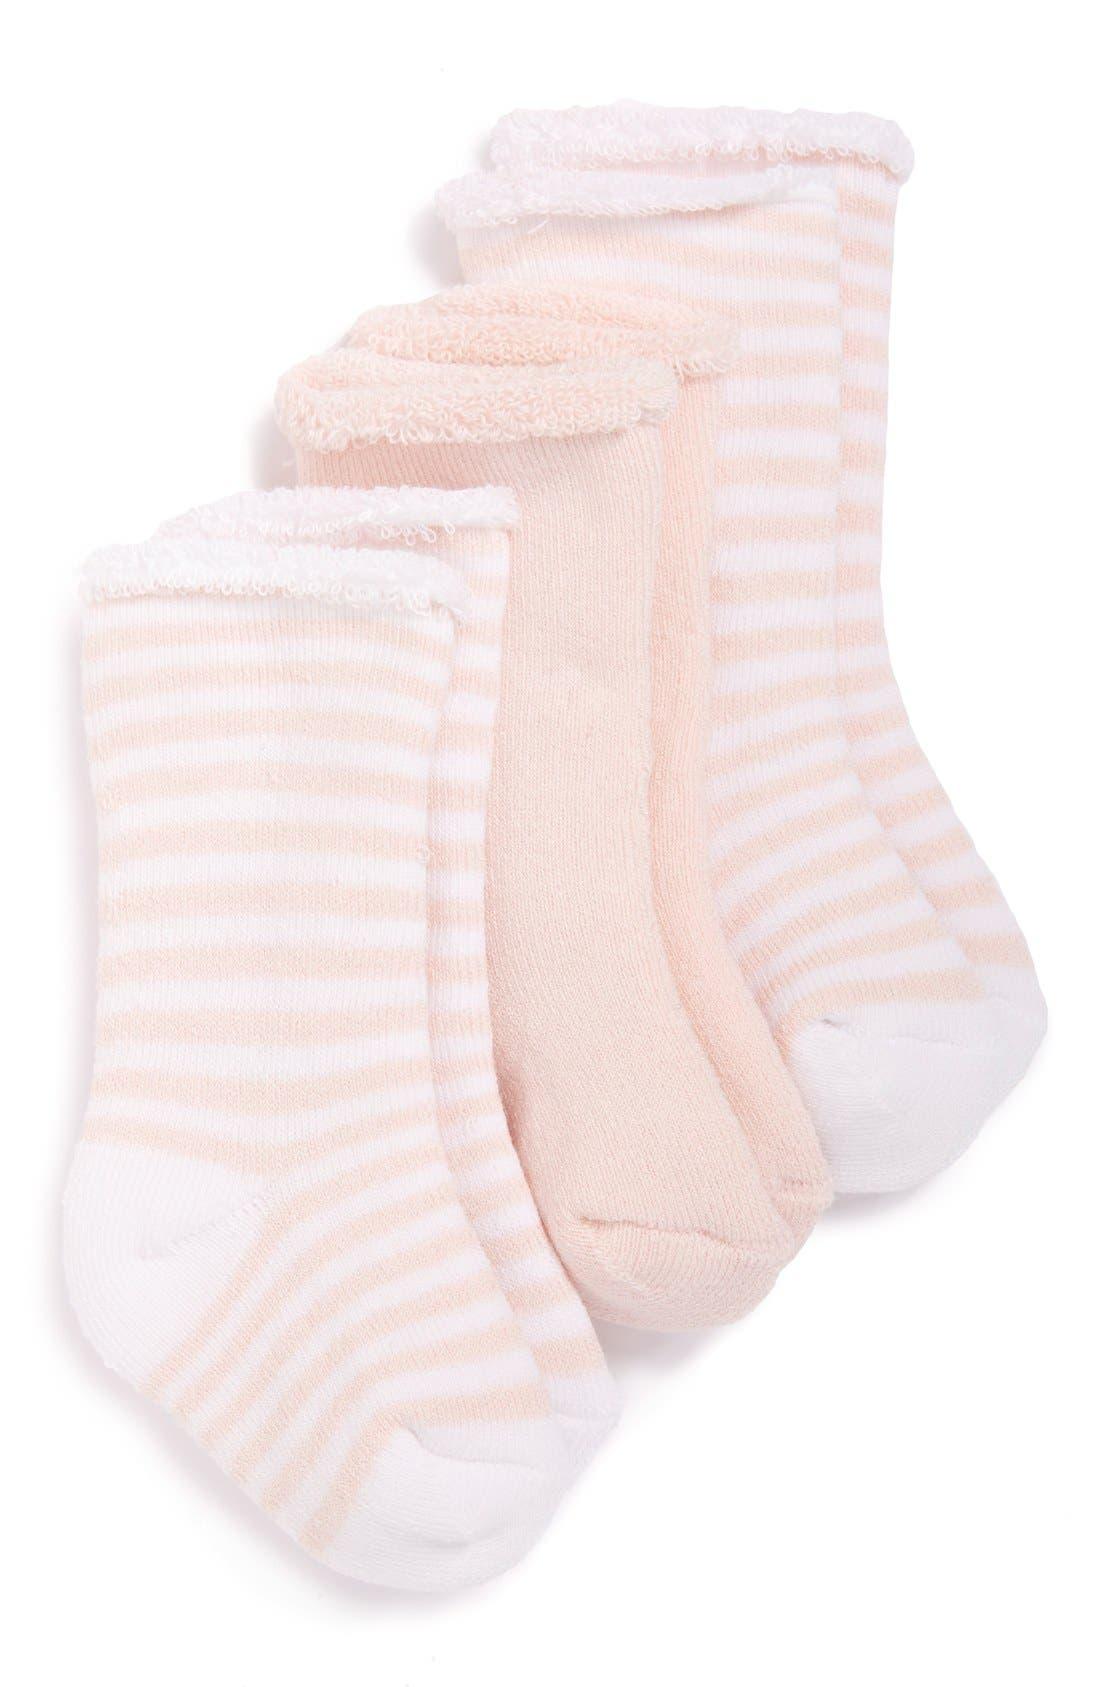 NORDSTROM BABY 3-Pack Crew Socks